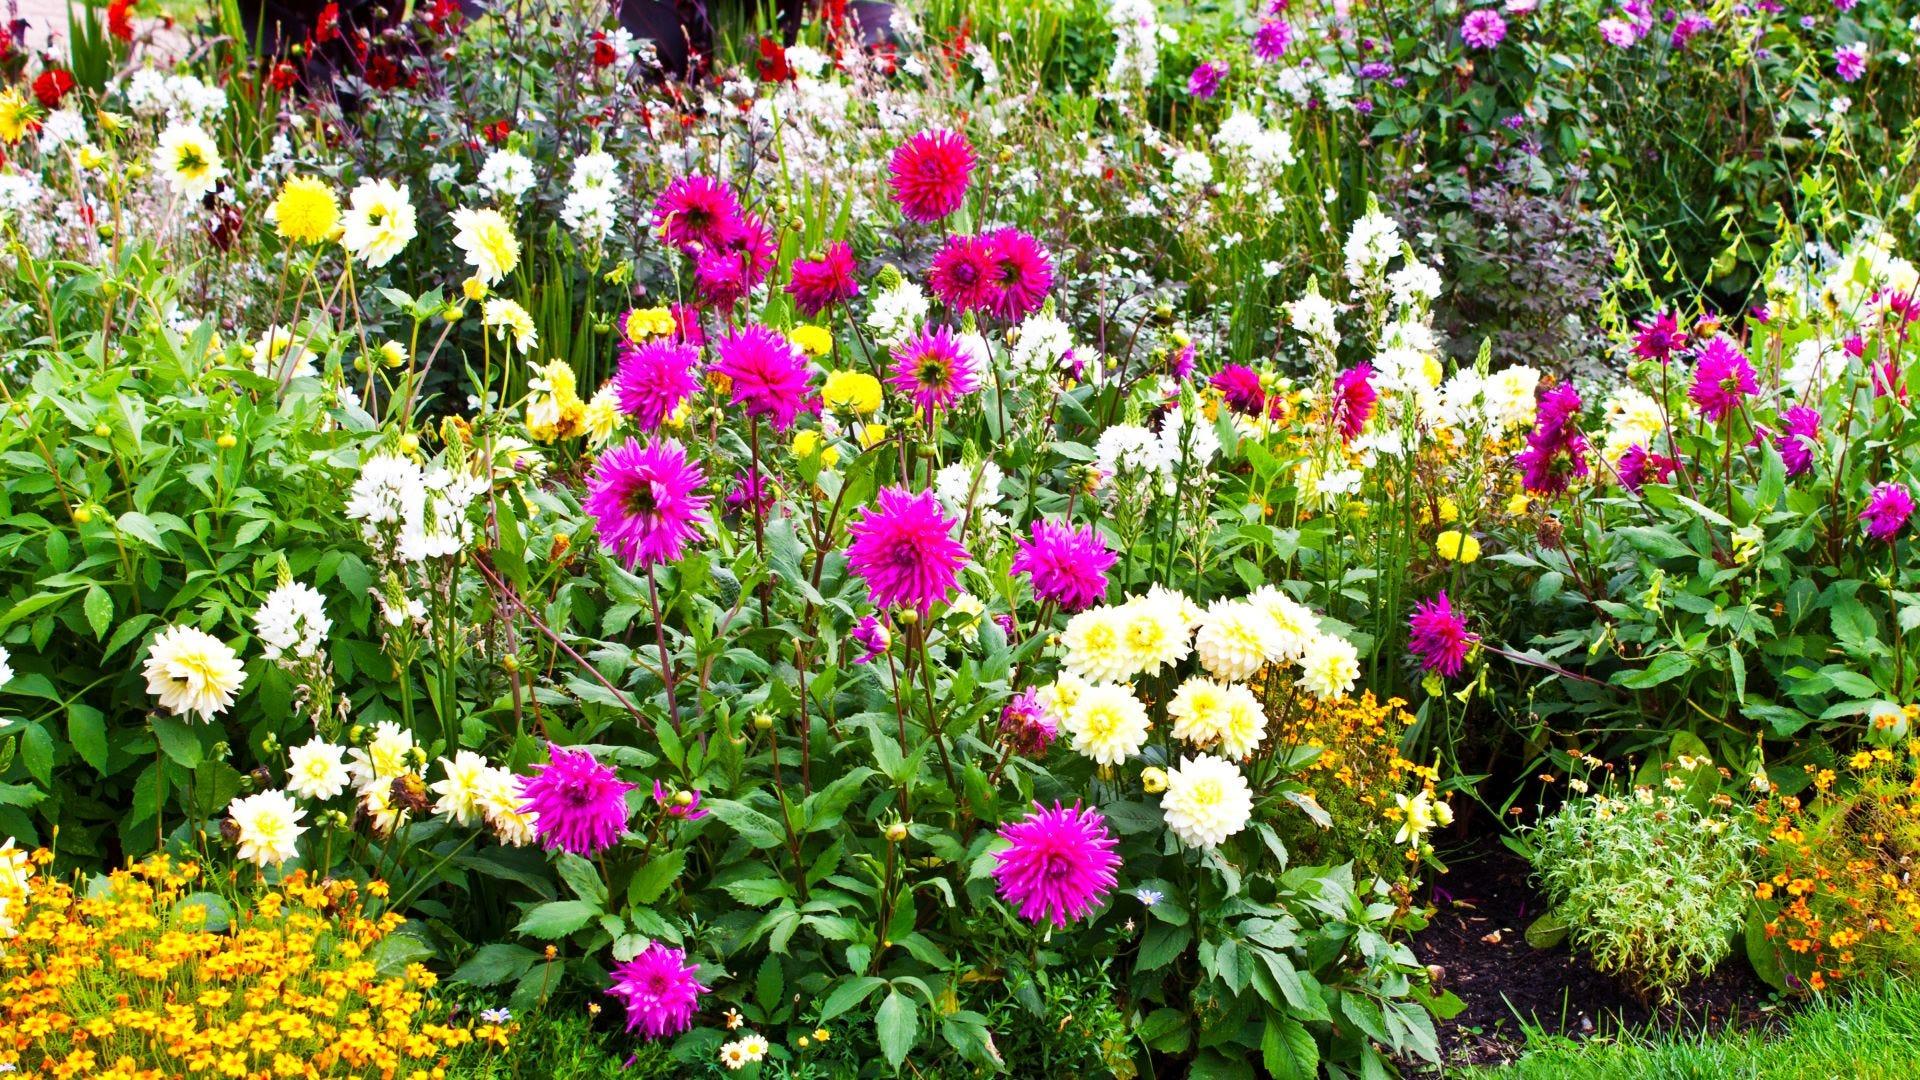 A colorful flower garden.